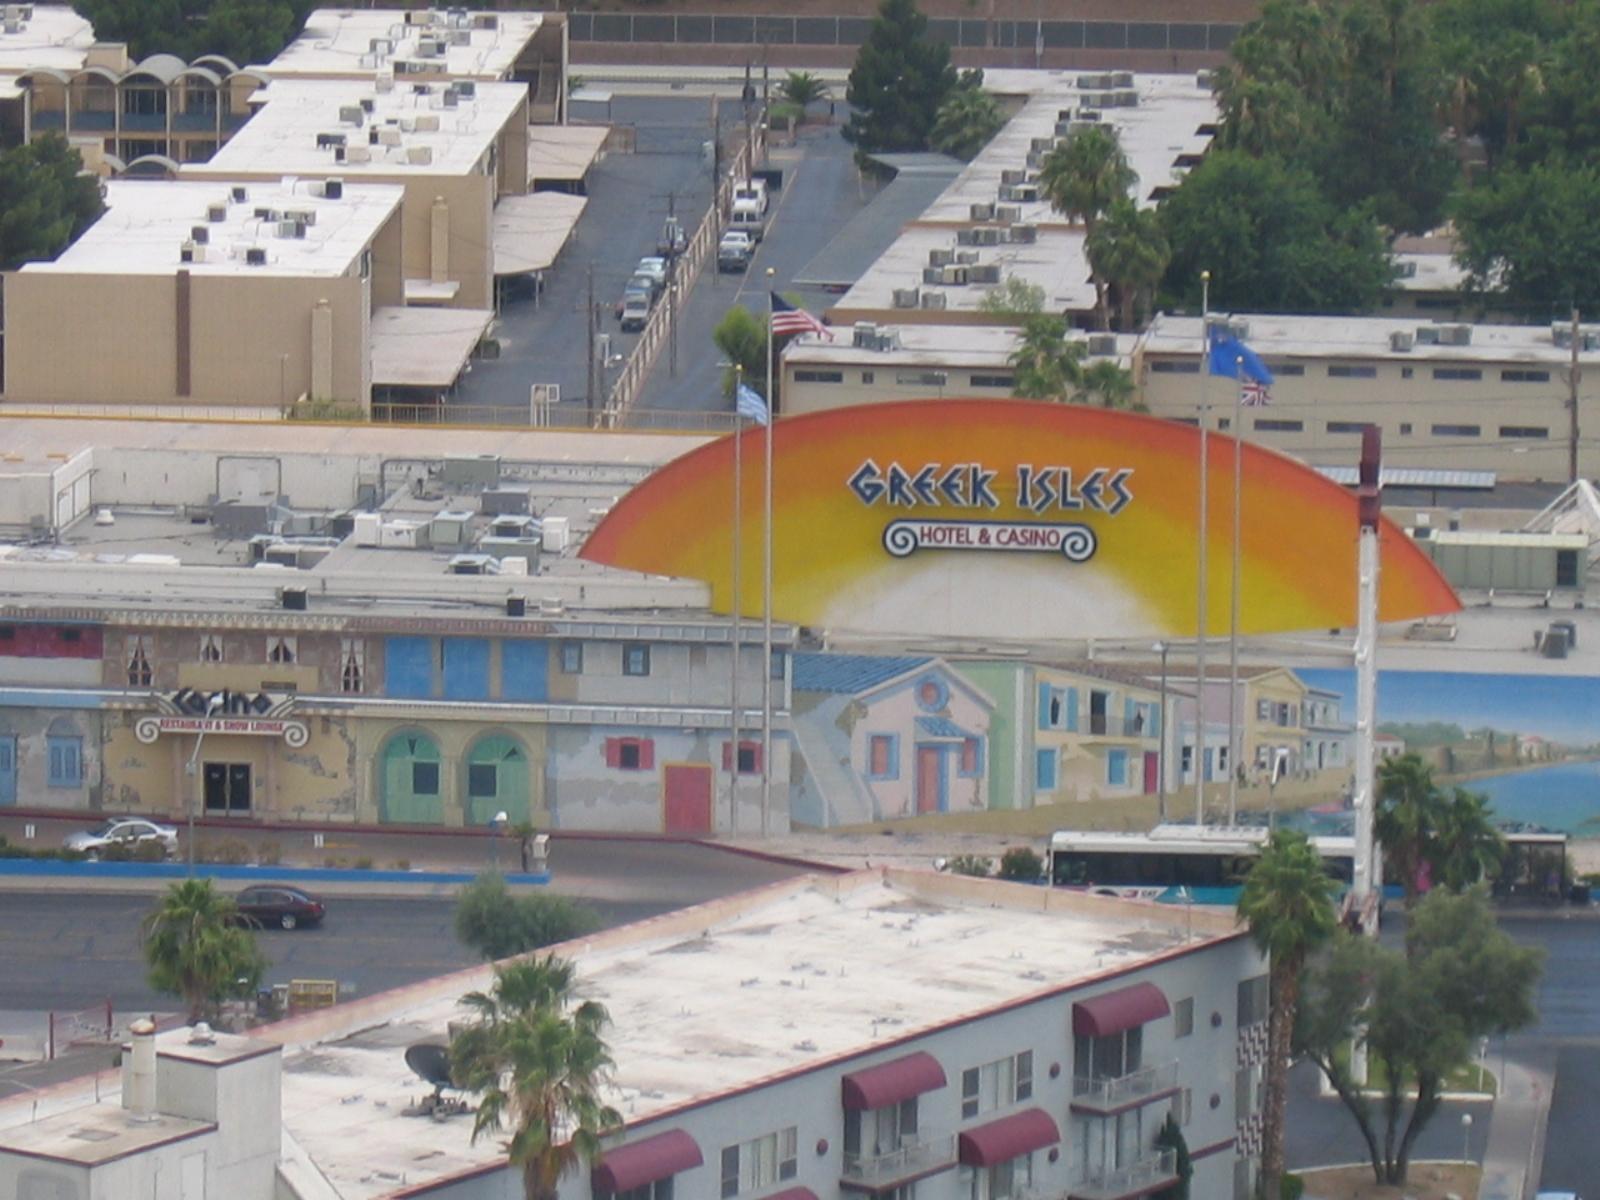 Greek-Isles-Casino-Las-Vegas.jpg